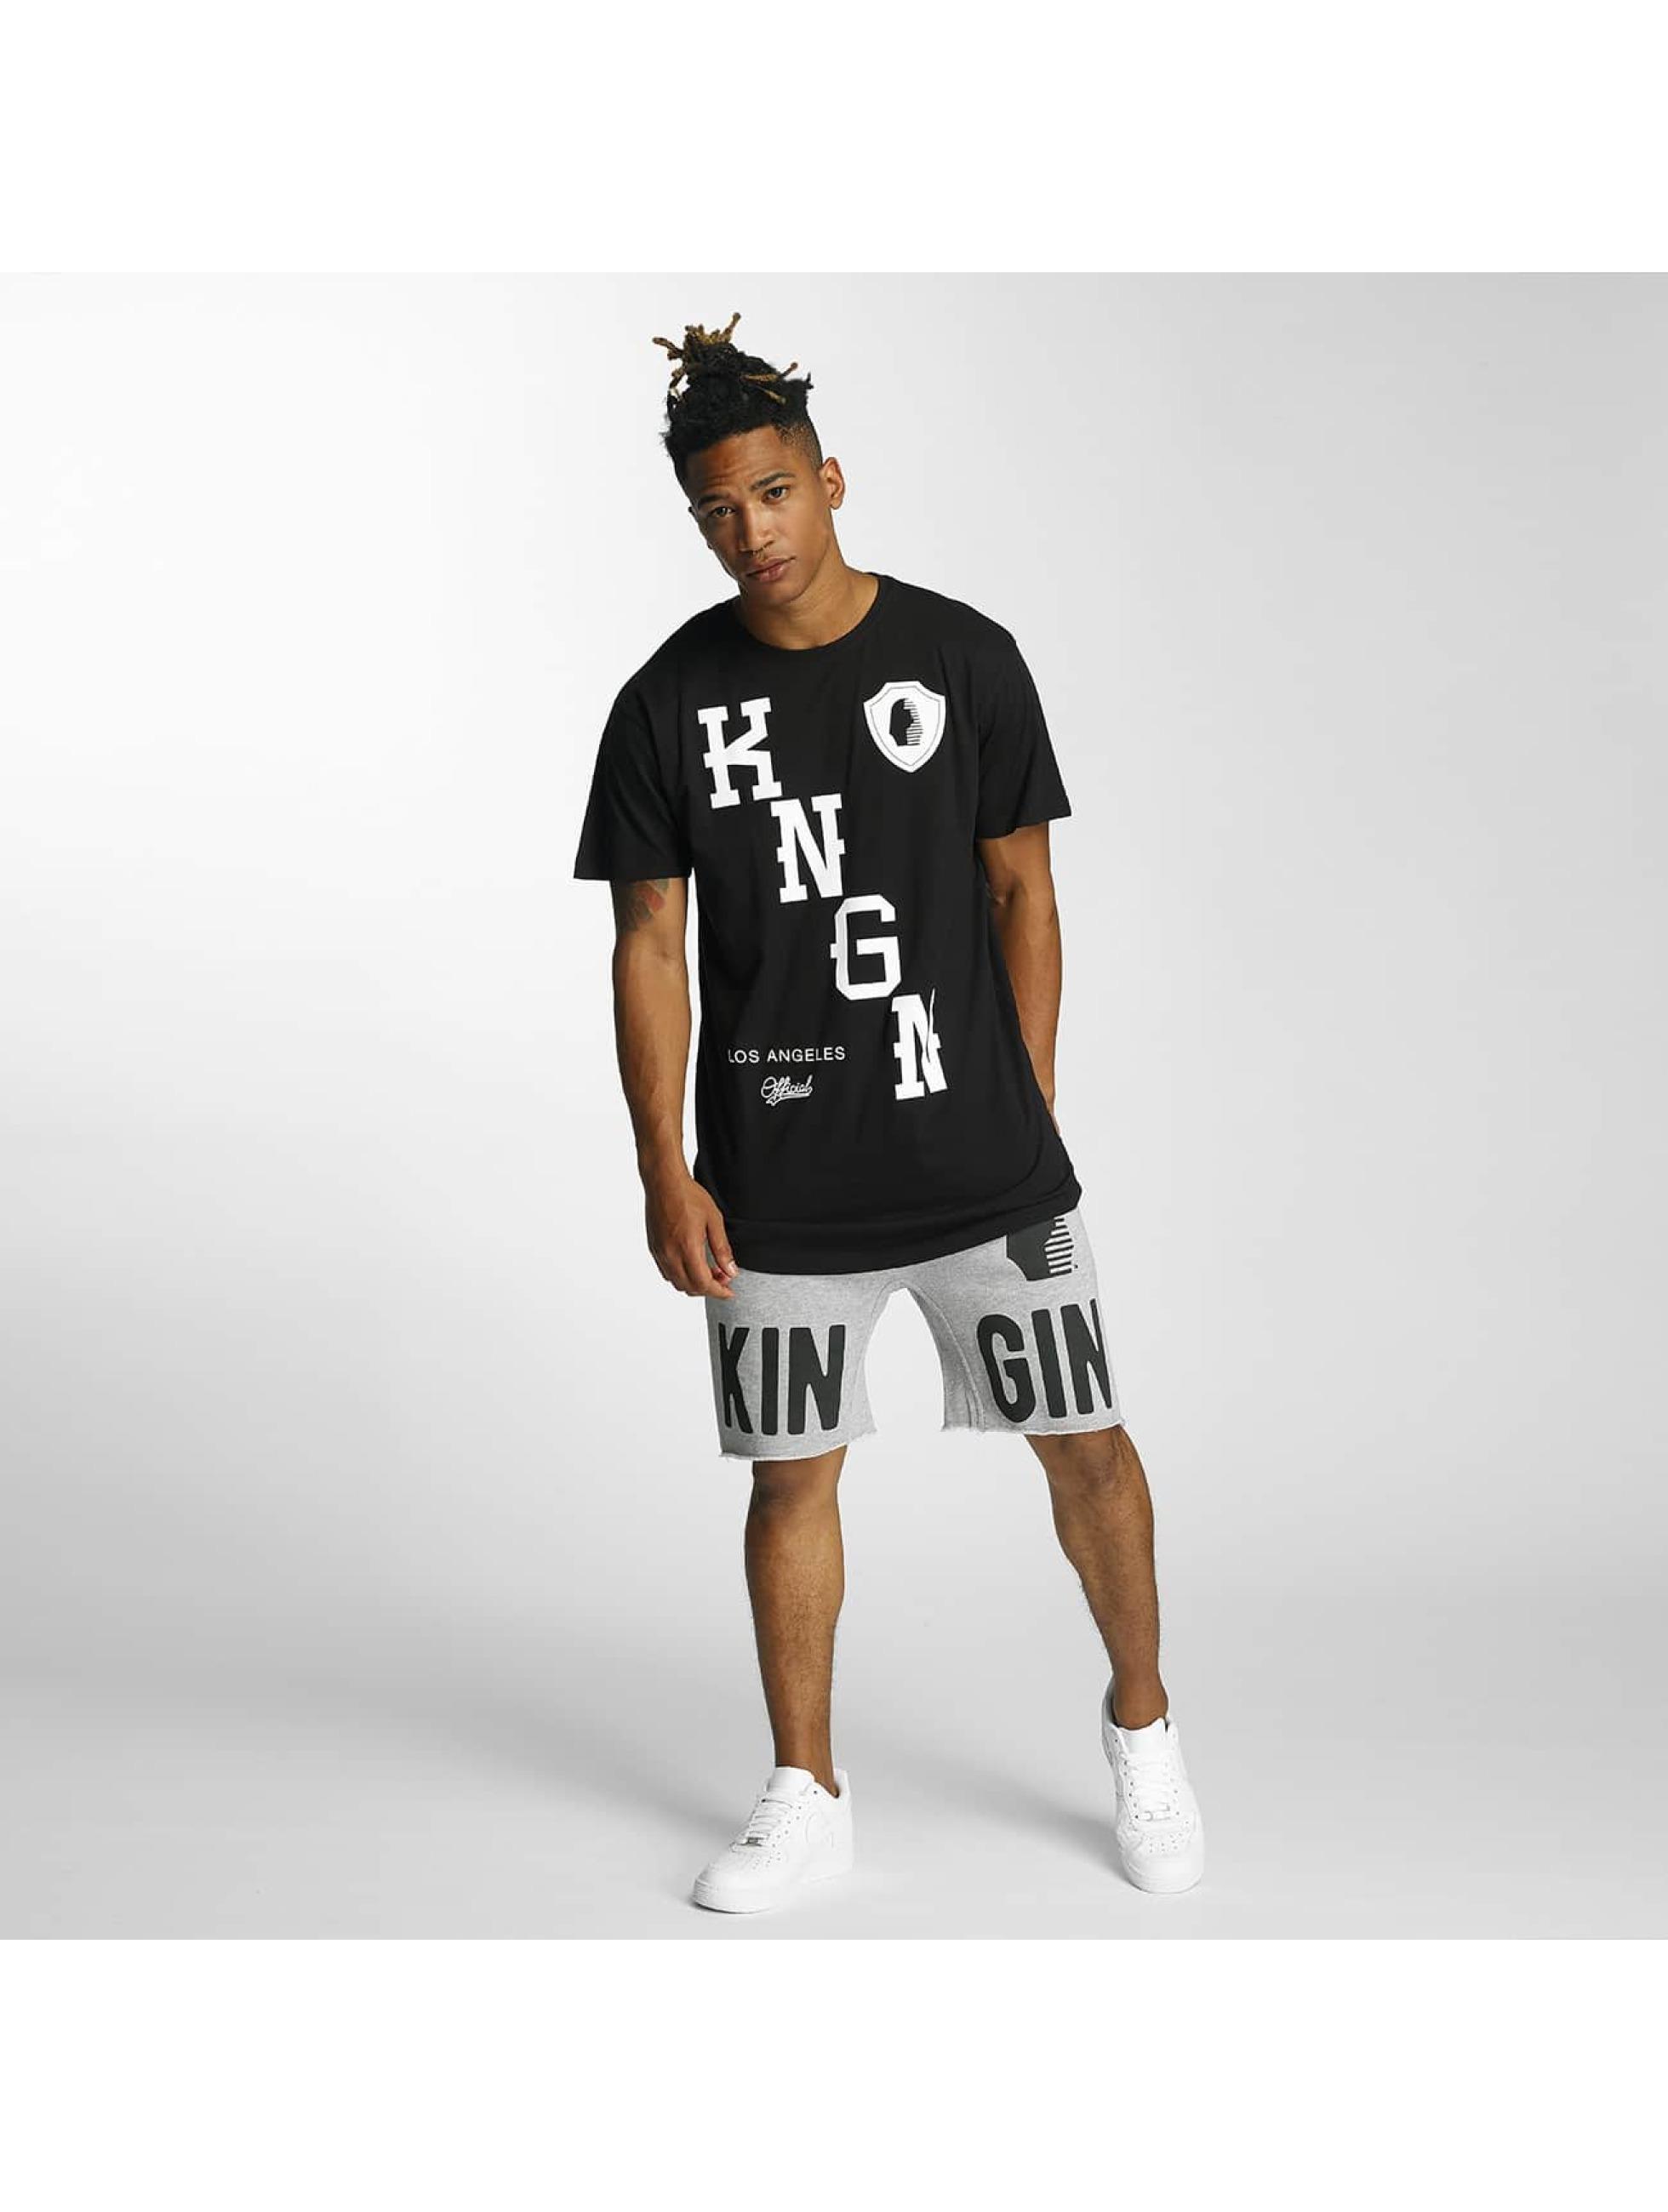 Kingin Camiseta KNGN negro